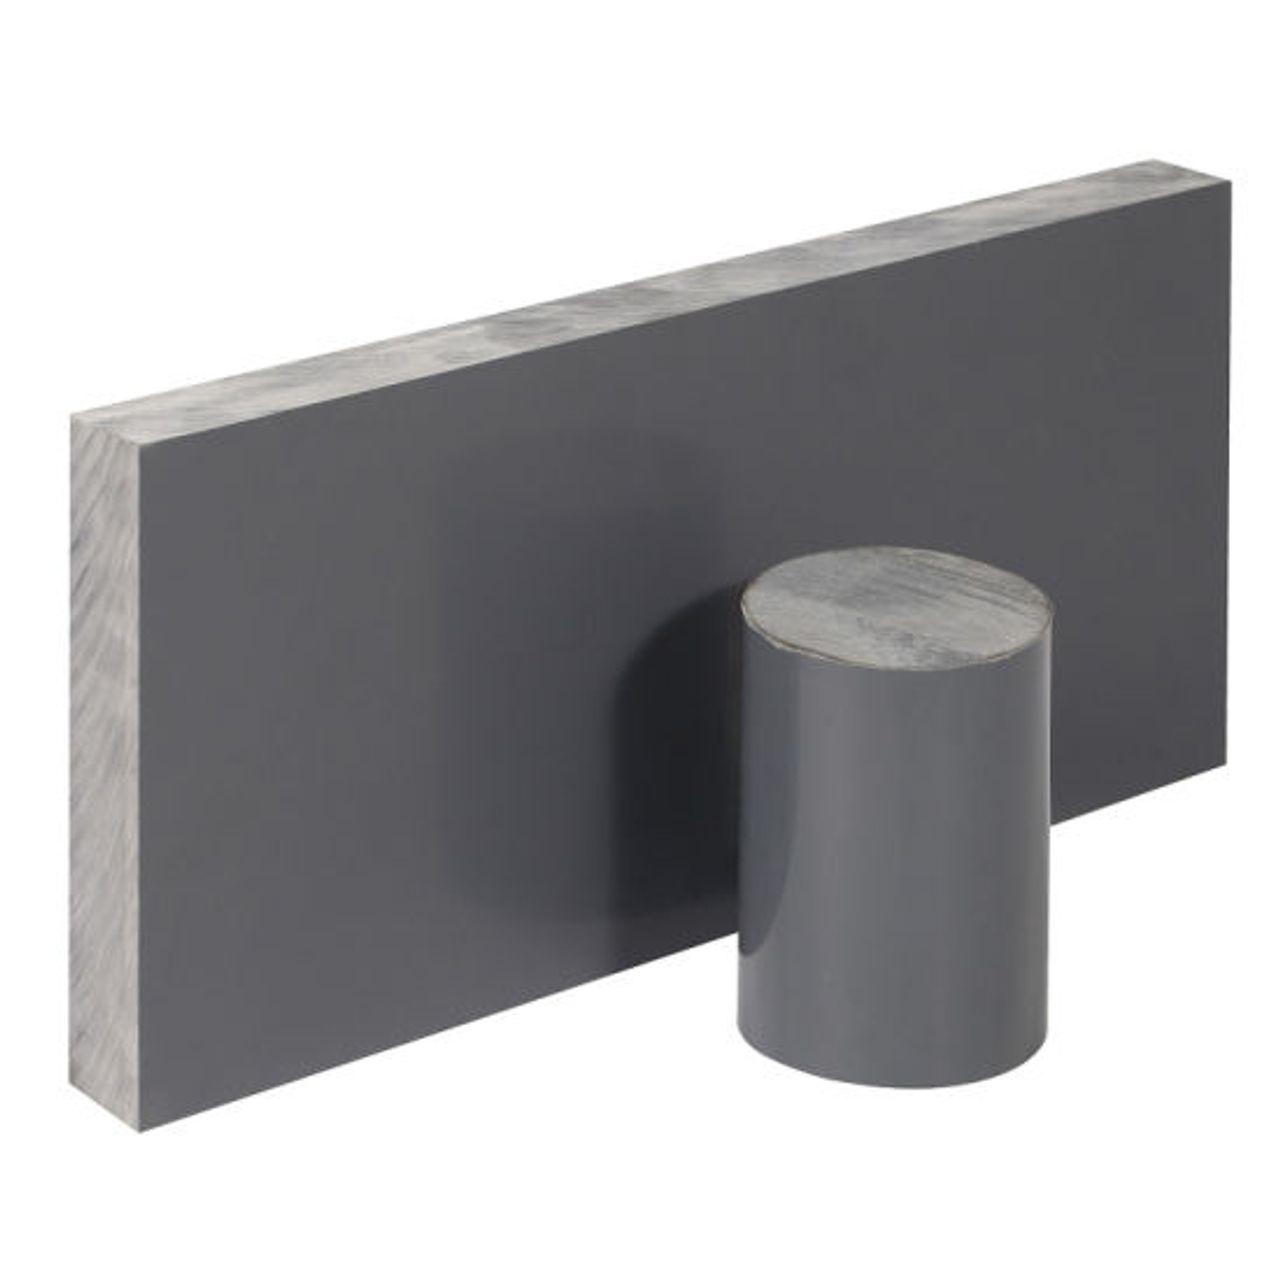 PVC (Polyvinylchloride) kunststof staven